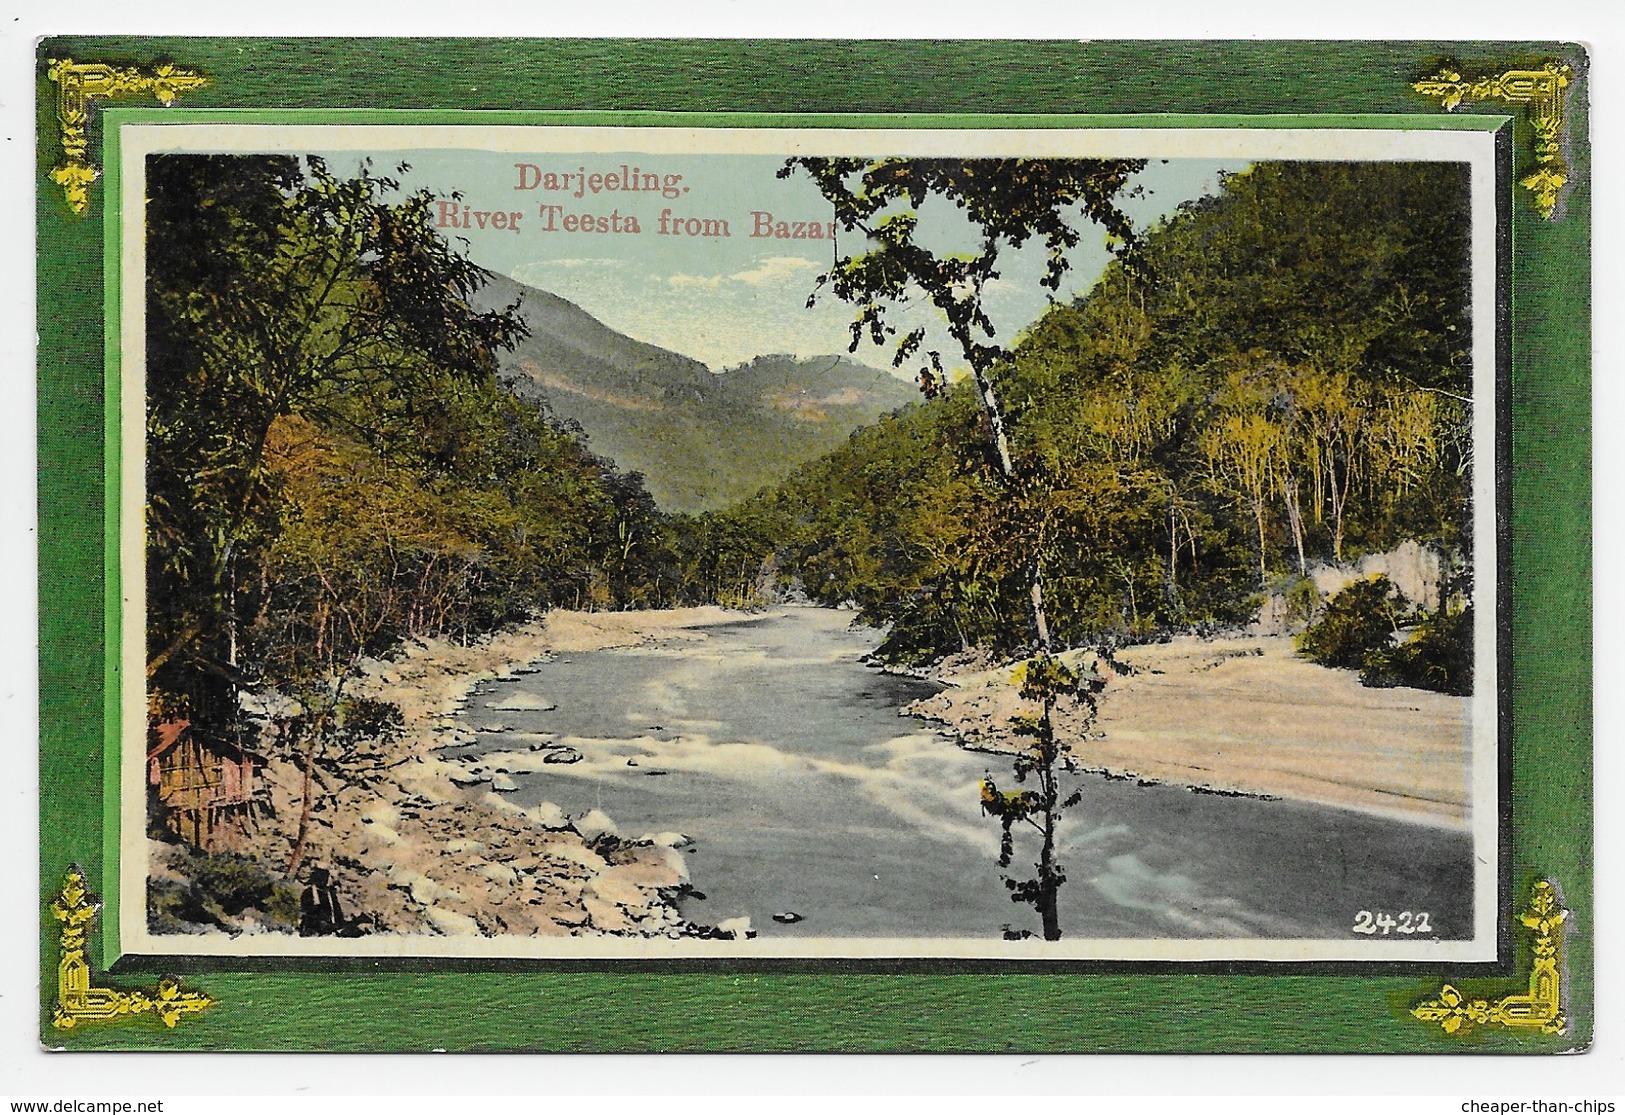 Darjeeling - River Teesta From Bazar - Nestor Gianaclis 2422 - India